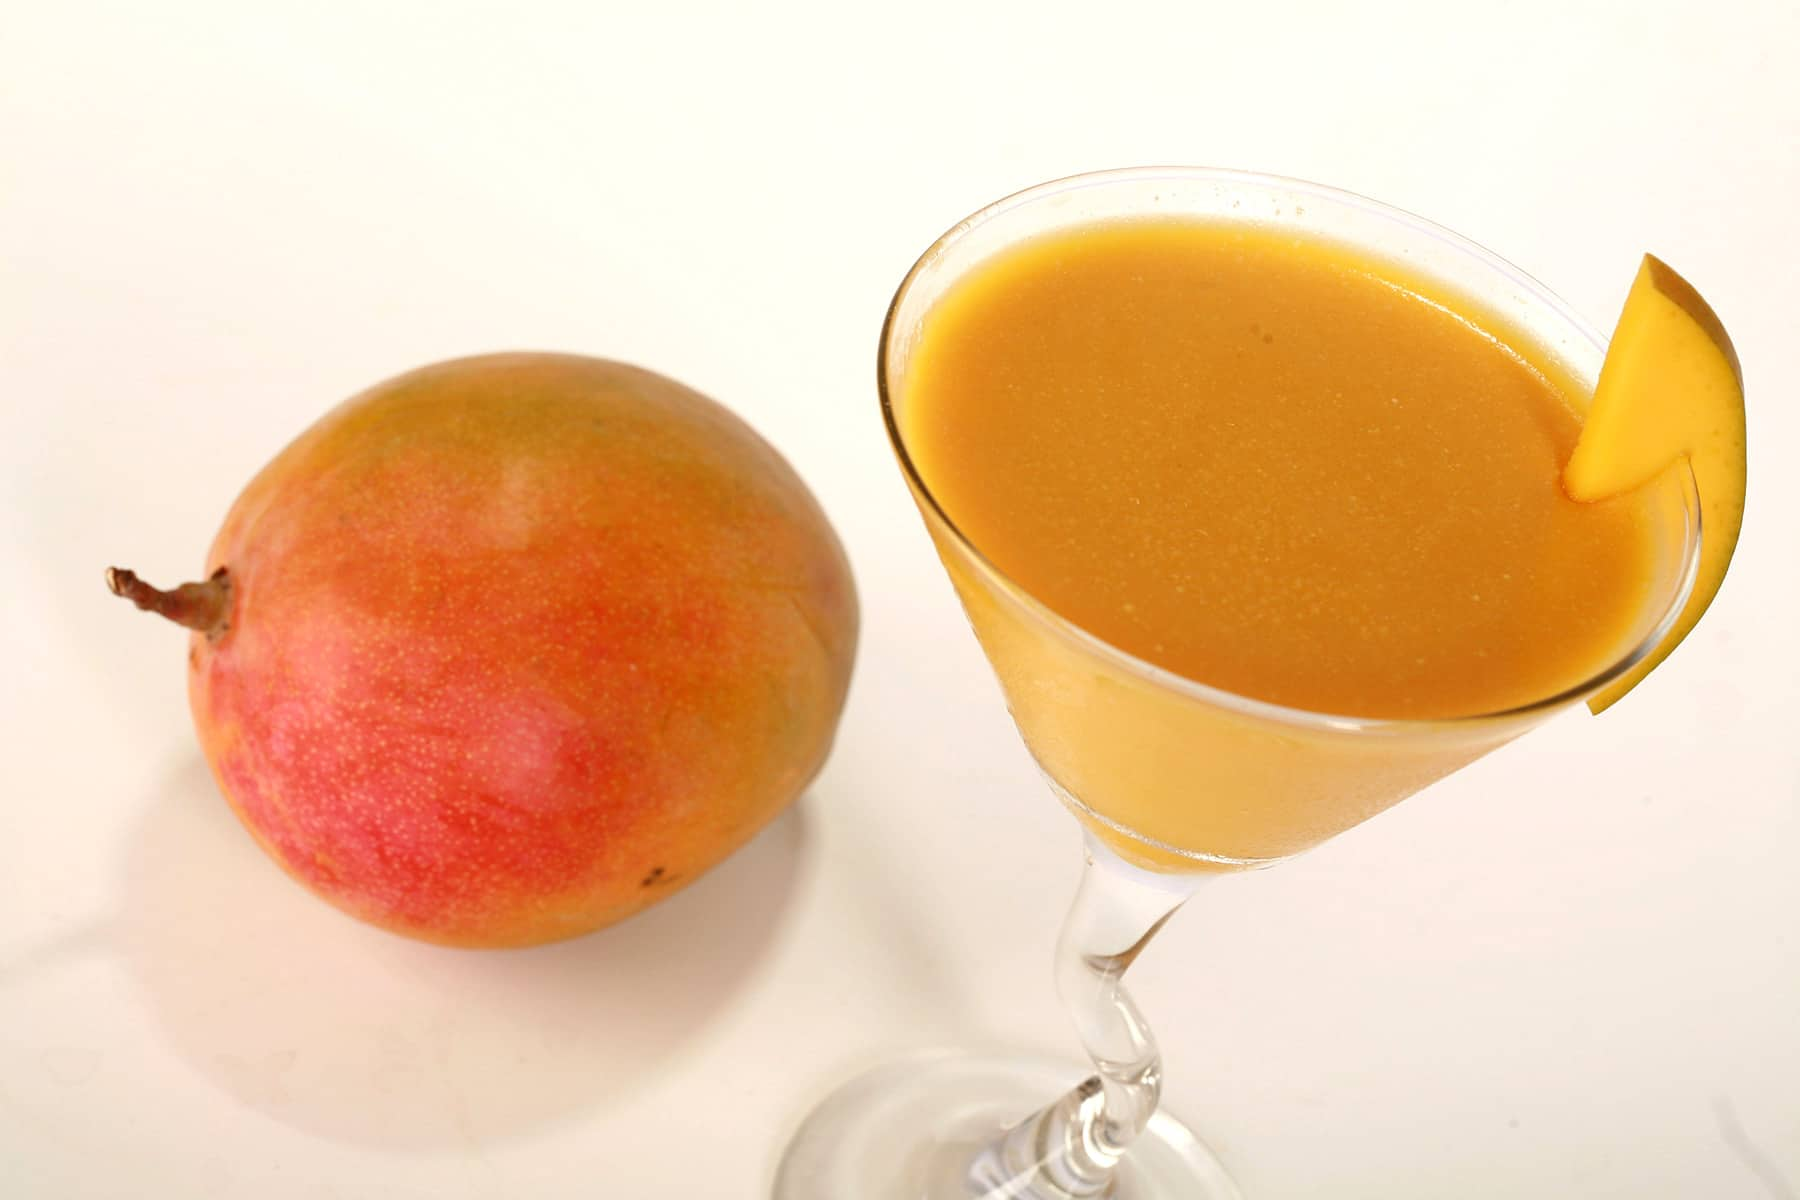 A martini glass of mango daiquiri panna cotta, with a whole mango next to it.